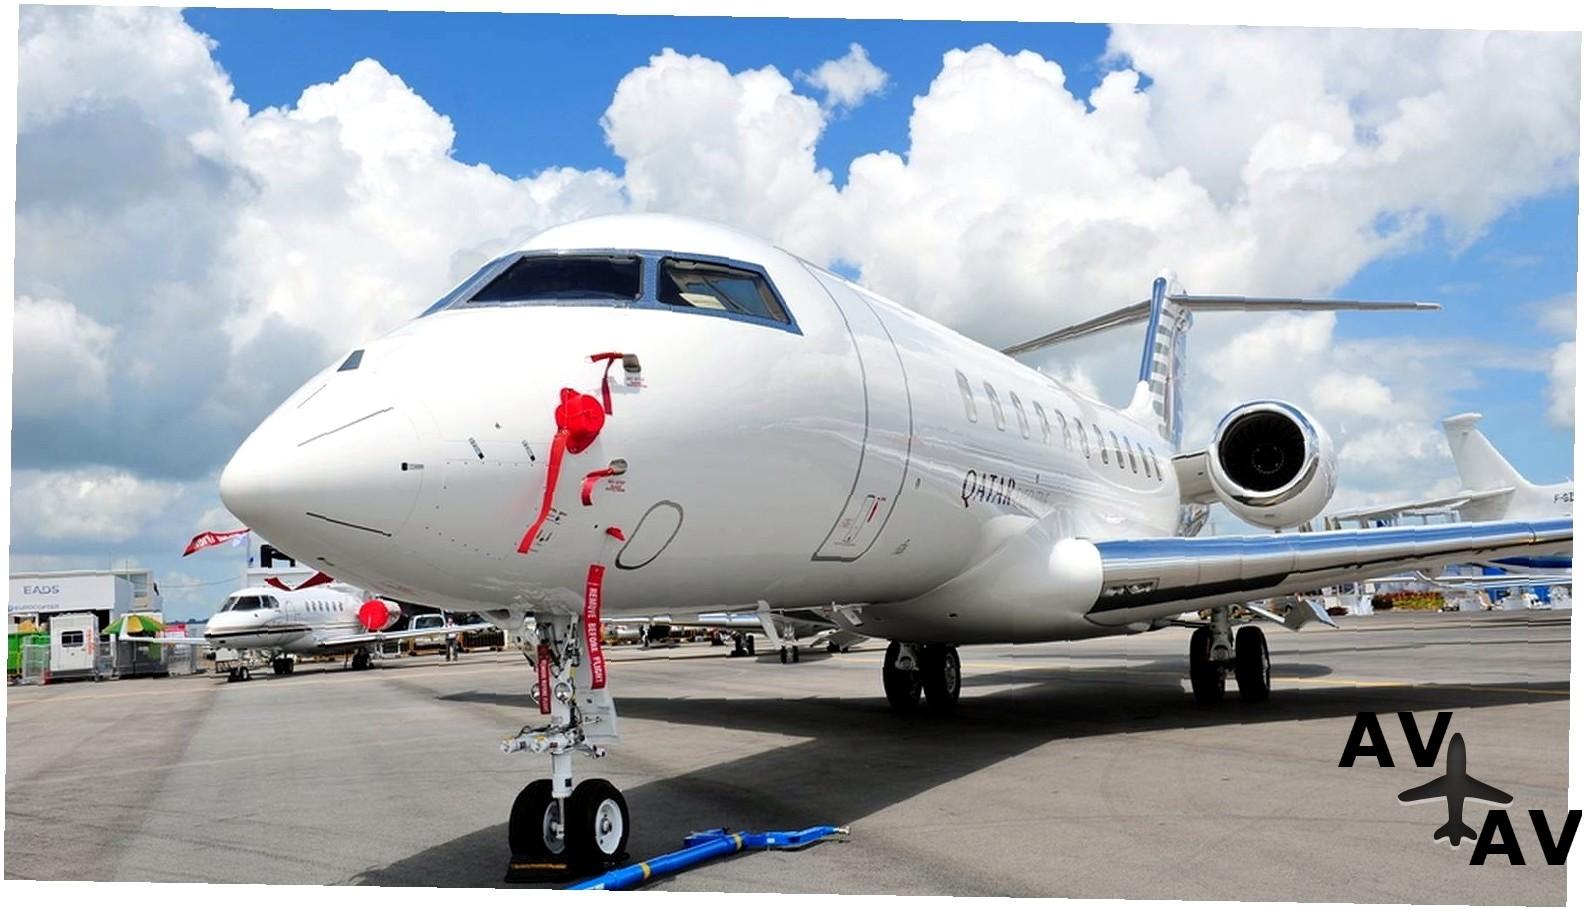 {:ru}Аэропорт Бандаранаике (Bandaranayake) коды IATA: CMB ICAO: VCBI город: Коломбо (Colombo) страна: Шри-Ланка (Sri Lanka){:}{:ua}Аеропорт Бандаранаїке (Bandaranayake) коди IATA: CMB ICAO: VCBI місто: Коломбо (Colombo) країна: Шрі-Ланка (Sri Lanka){:}